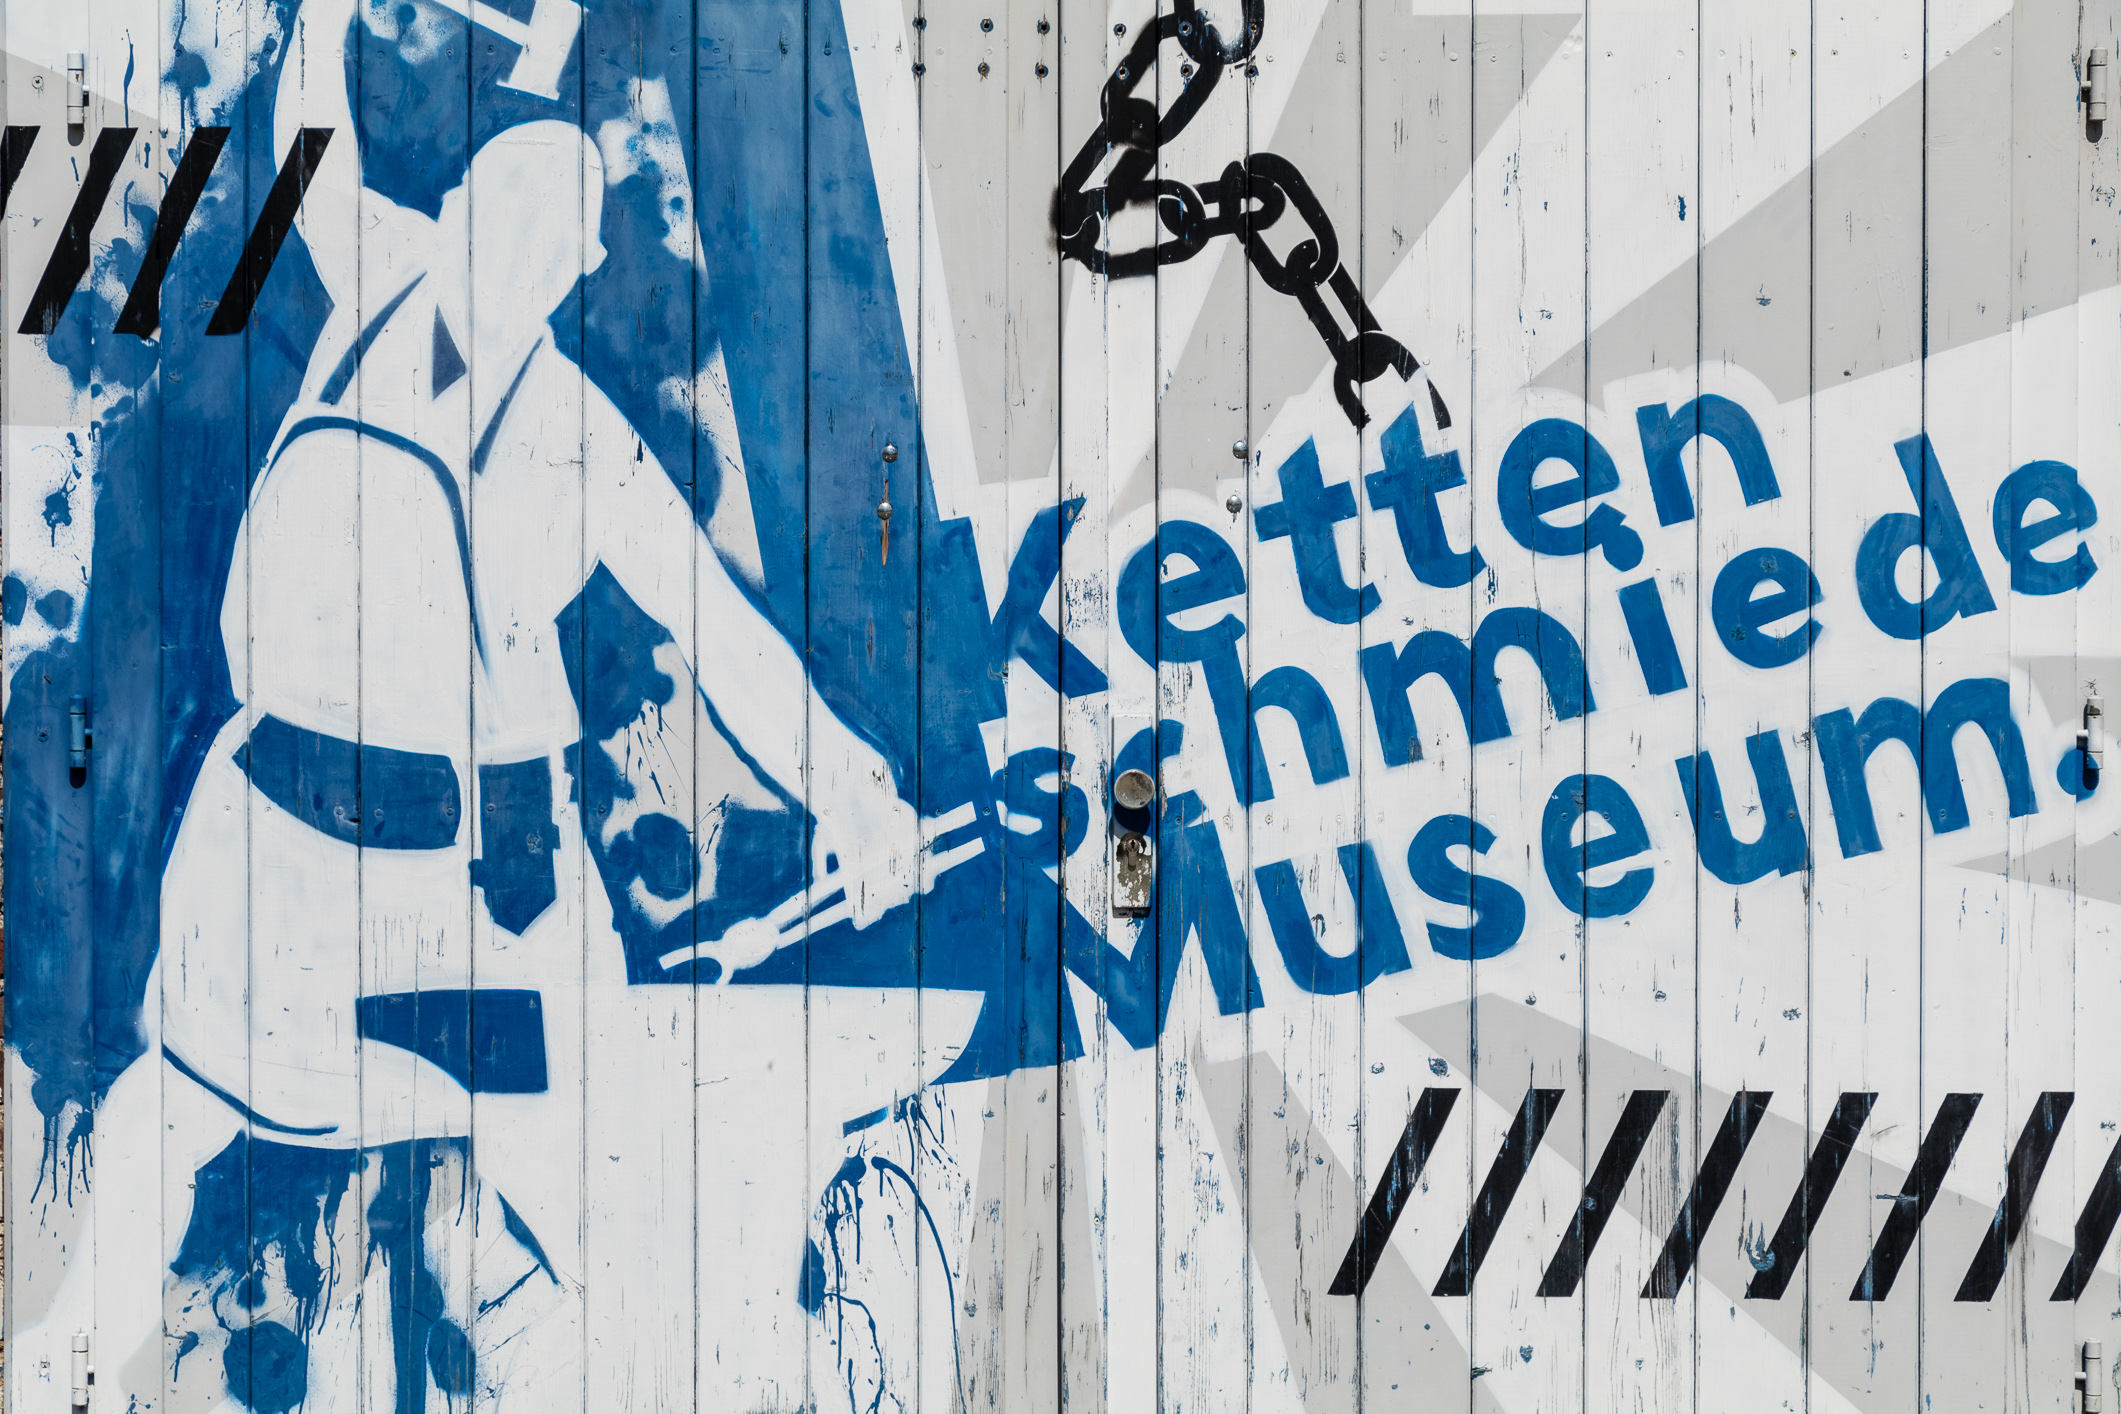 Kettenschmiedemuseum in Fröndenberg